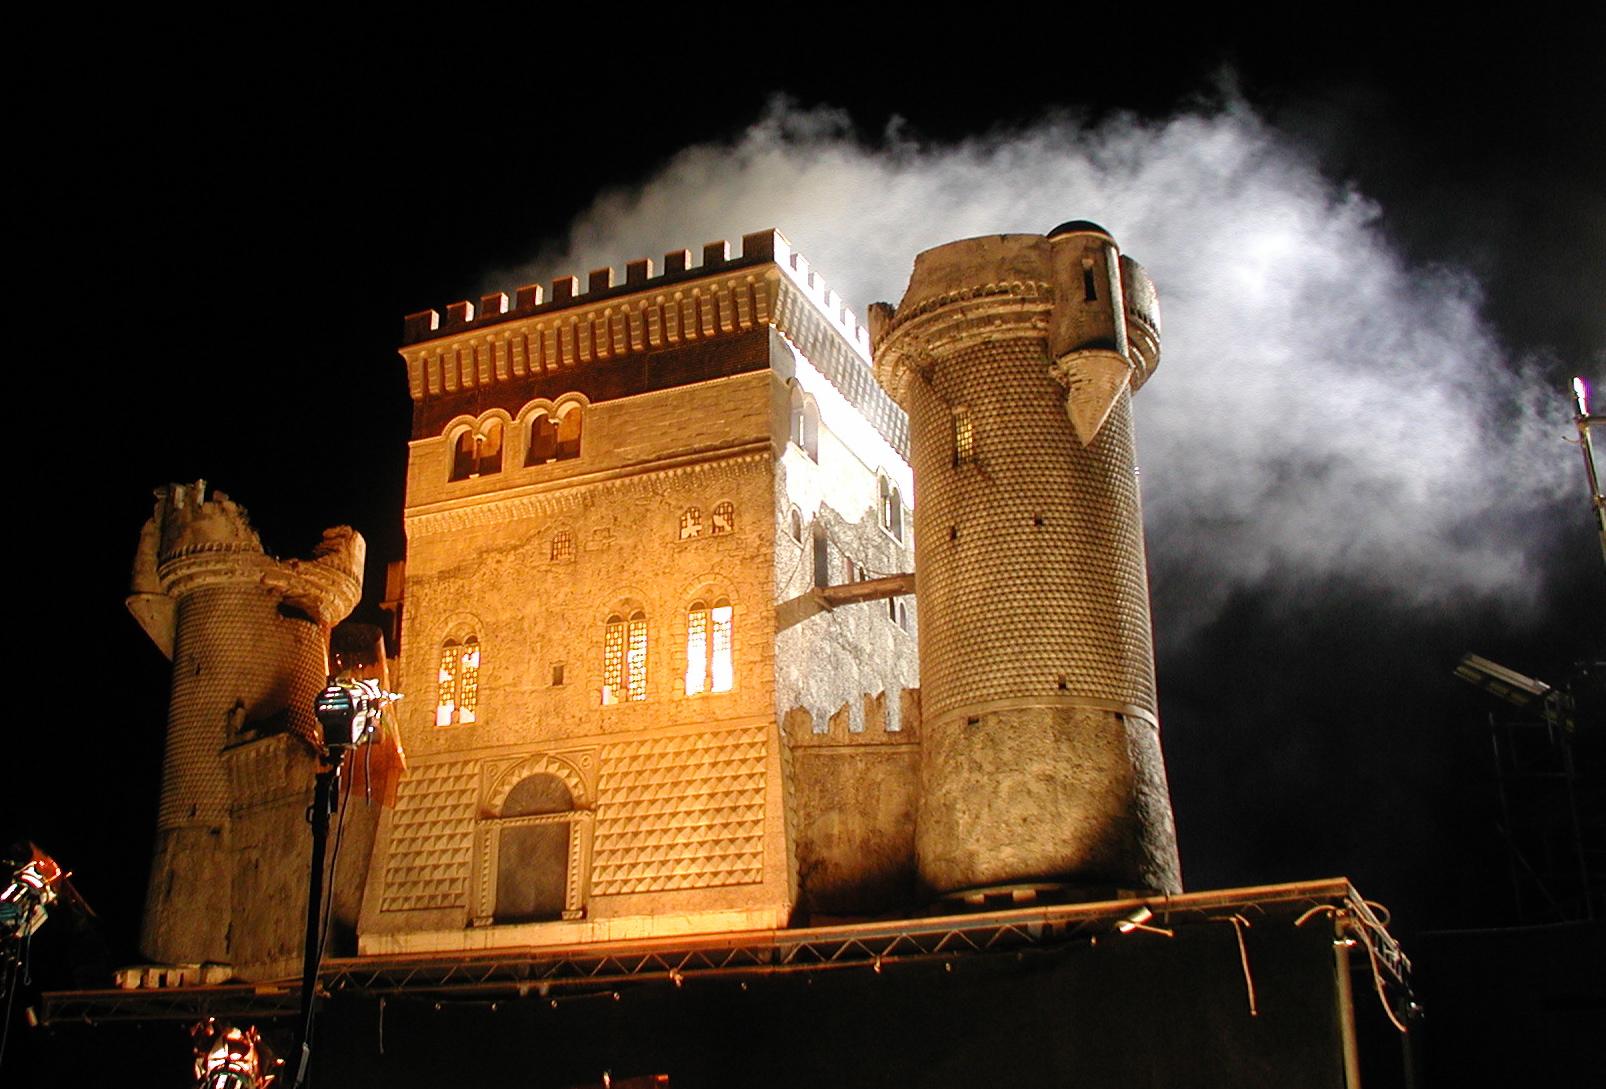 SFX Miniature Capricorn's Castle - Inkheart (2008)